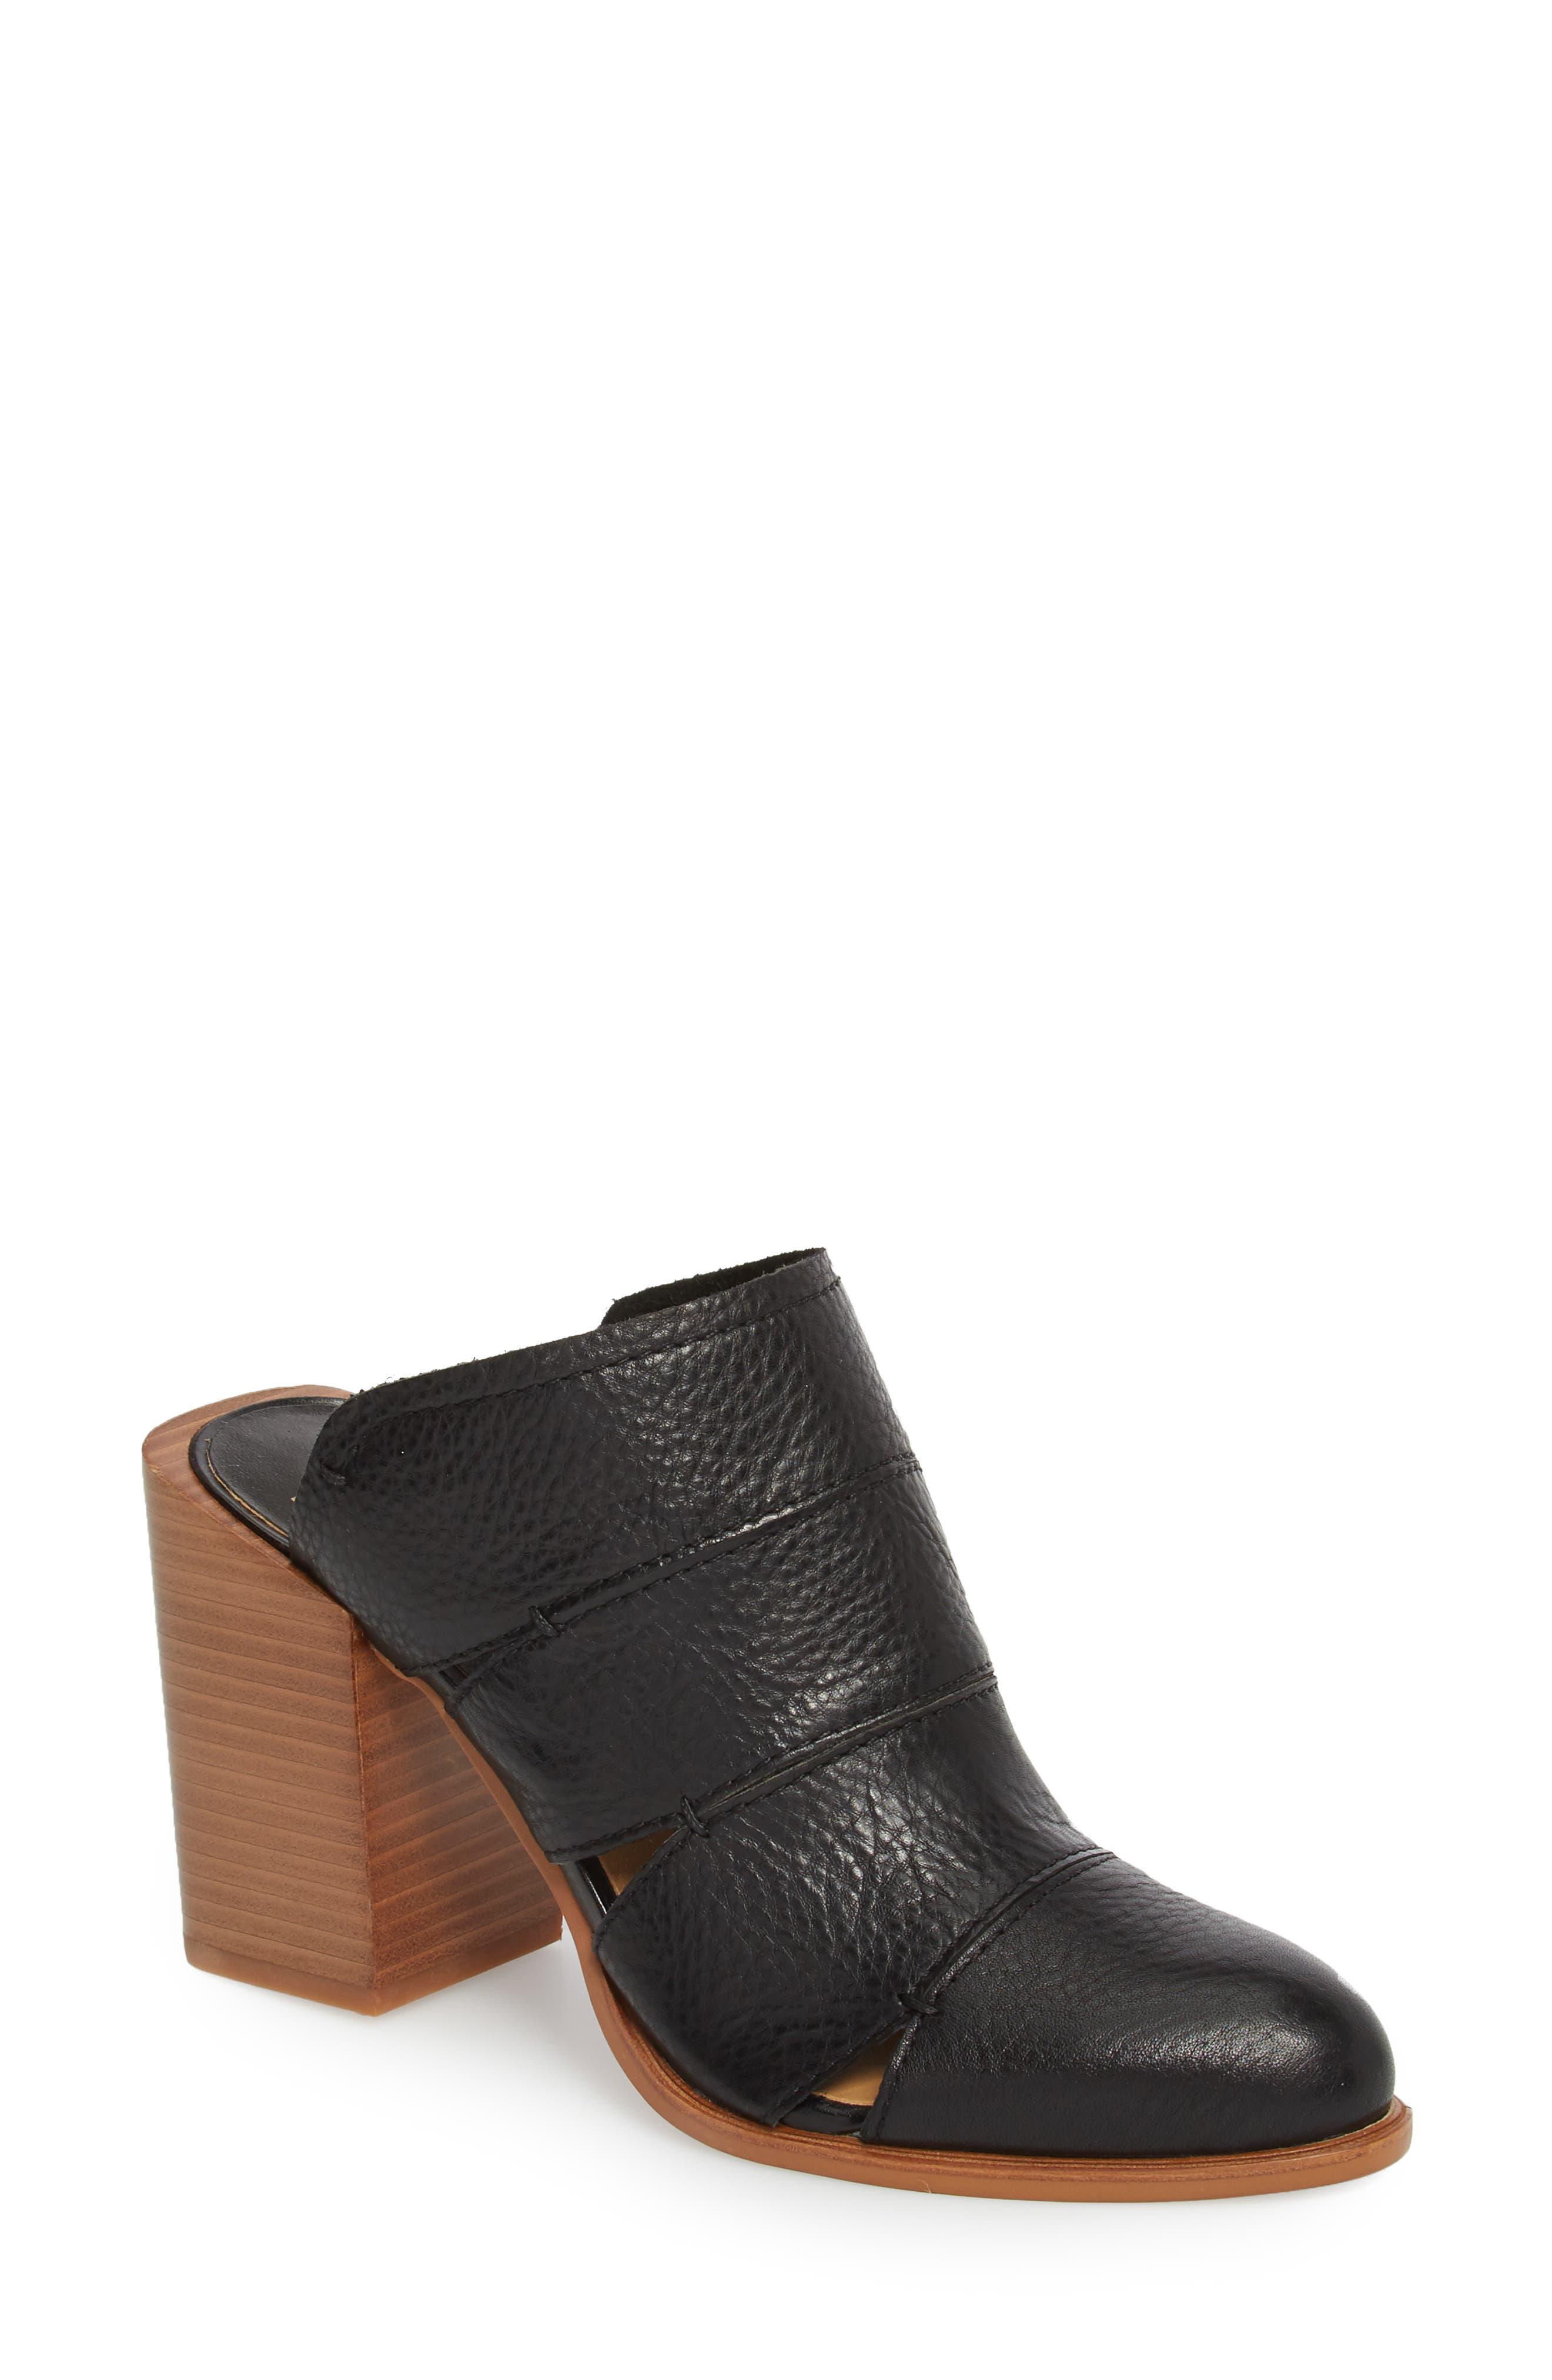 Makeo Mule,                             Main thumbnail 1, color,                             Black Leather